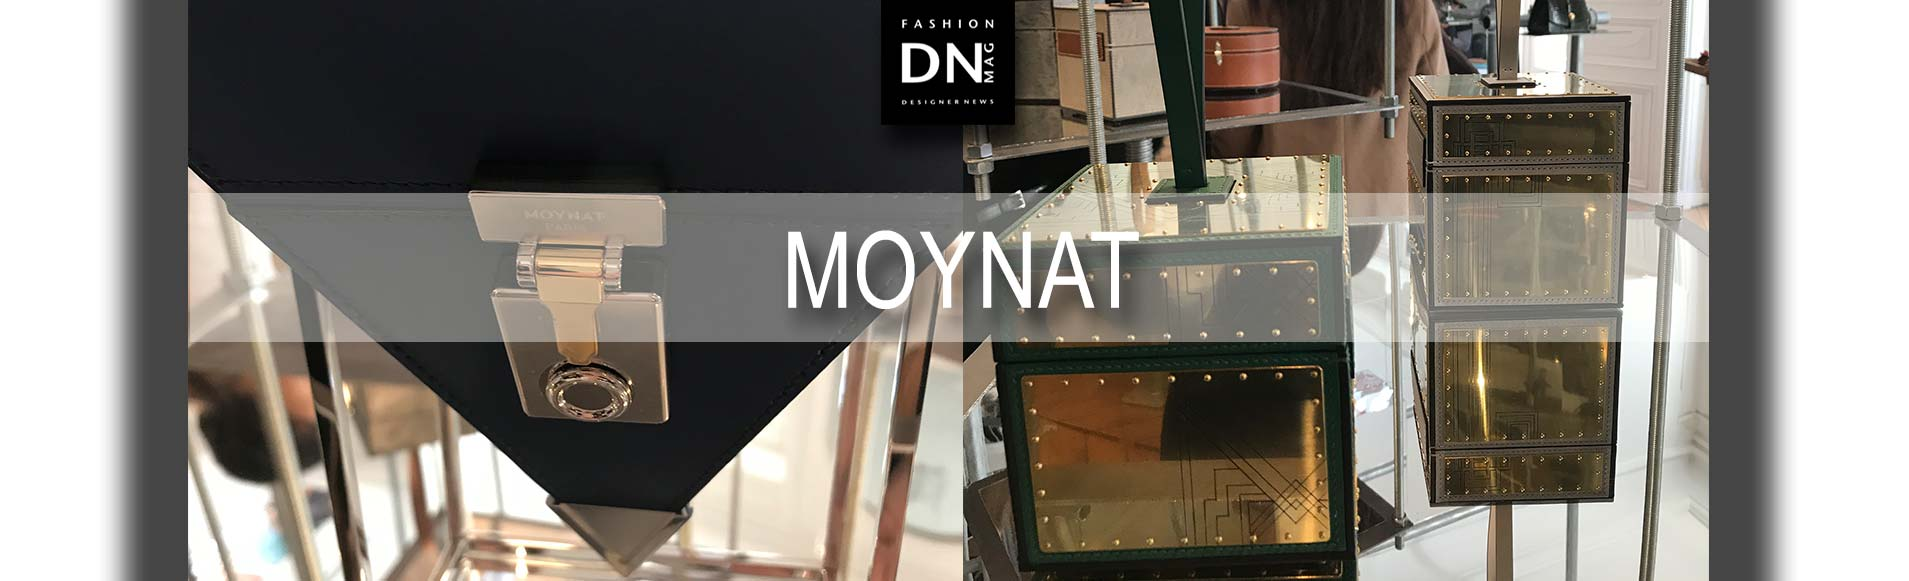 MOYNAT-RTW-19-FW-2019-DNMAG